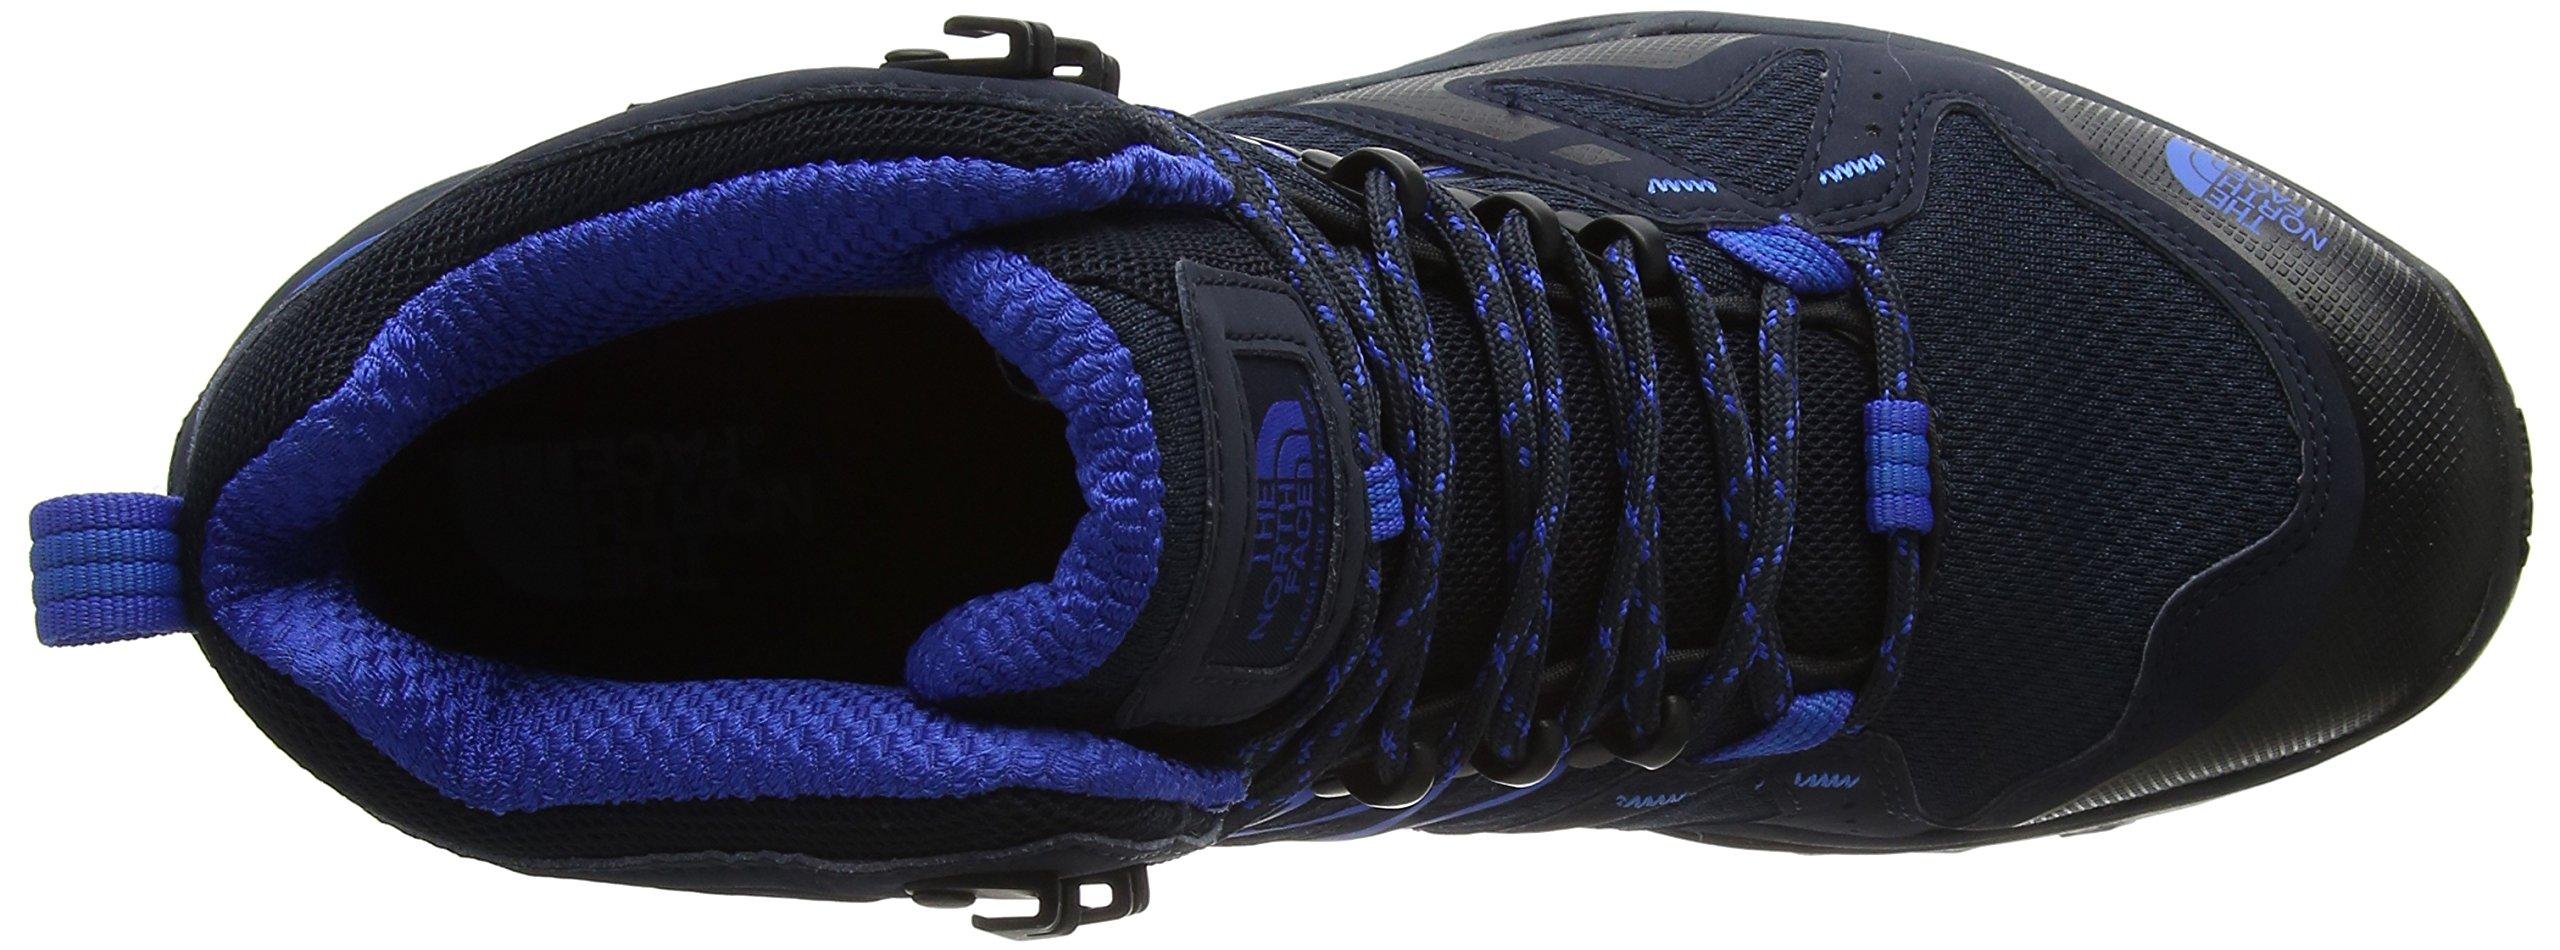 81tcya BpgL - THE NORTH FACE Men's Hedgehog Fastpack Mid Gtx High Rise Hiking Boots